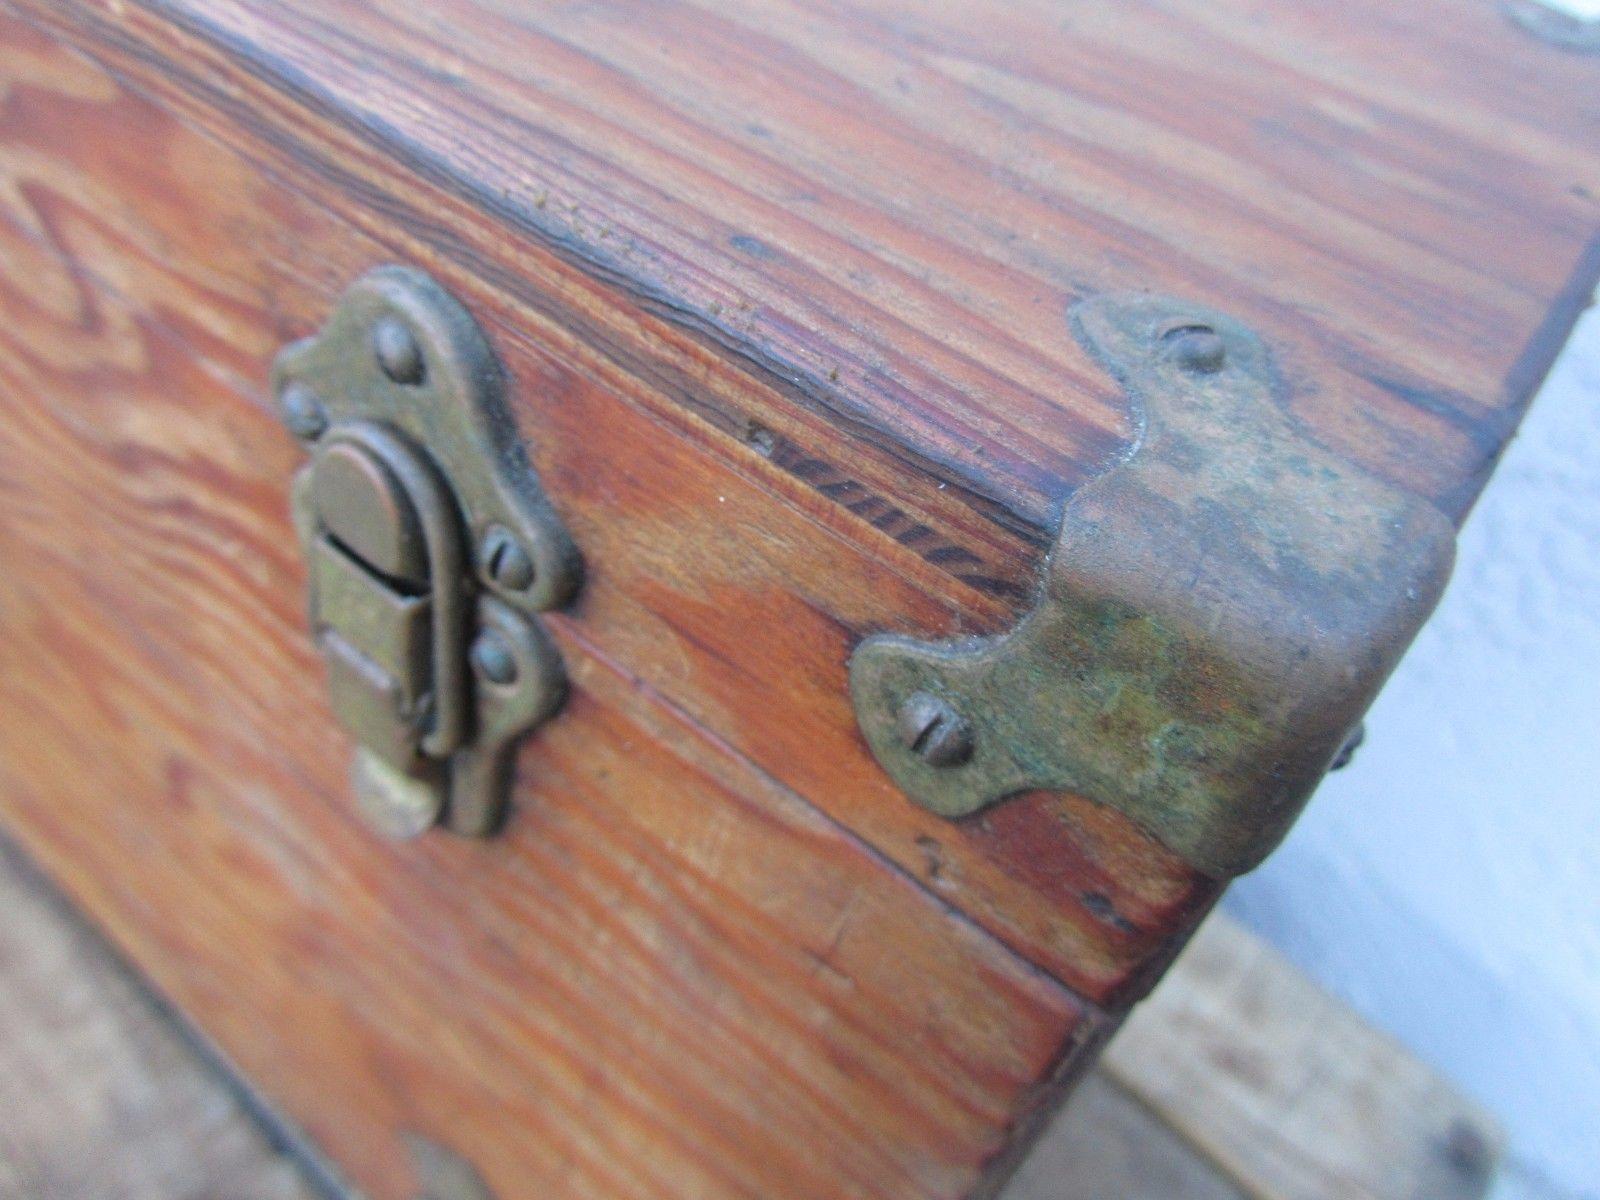 Vintage Wood Fishing Tackle Box Old Hardware Original Nice Ebay